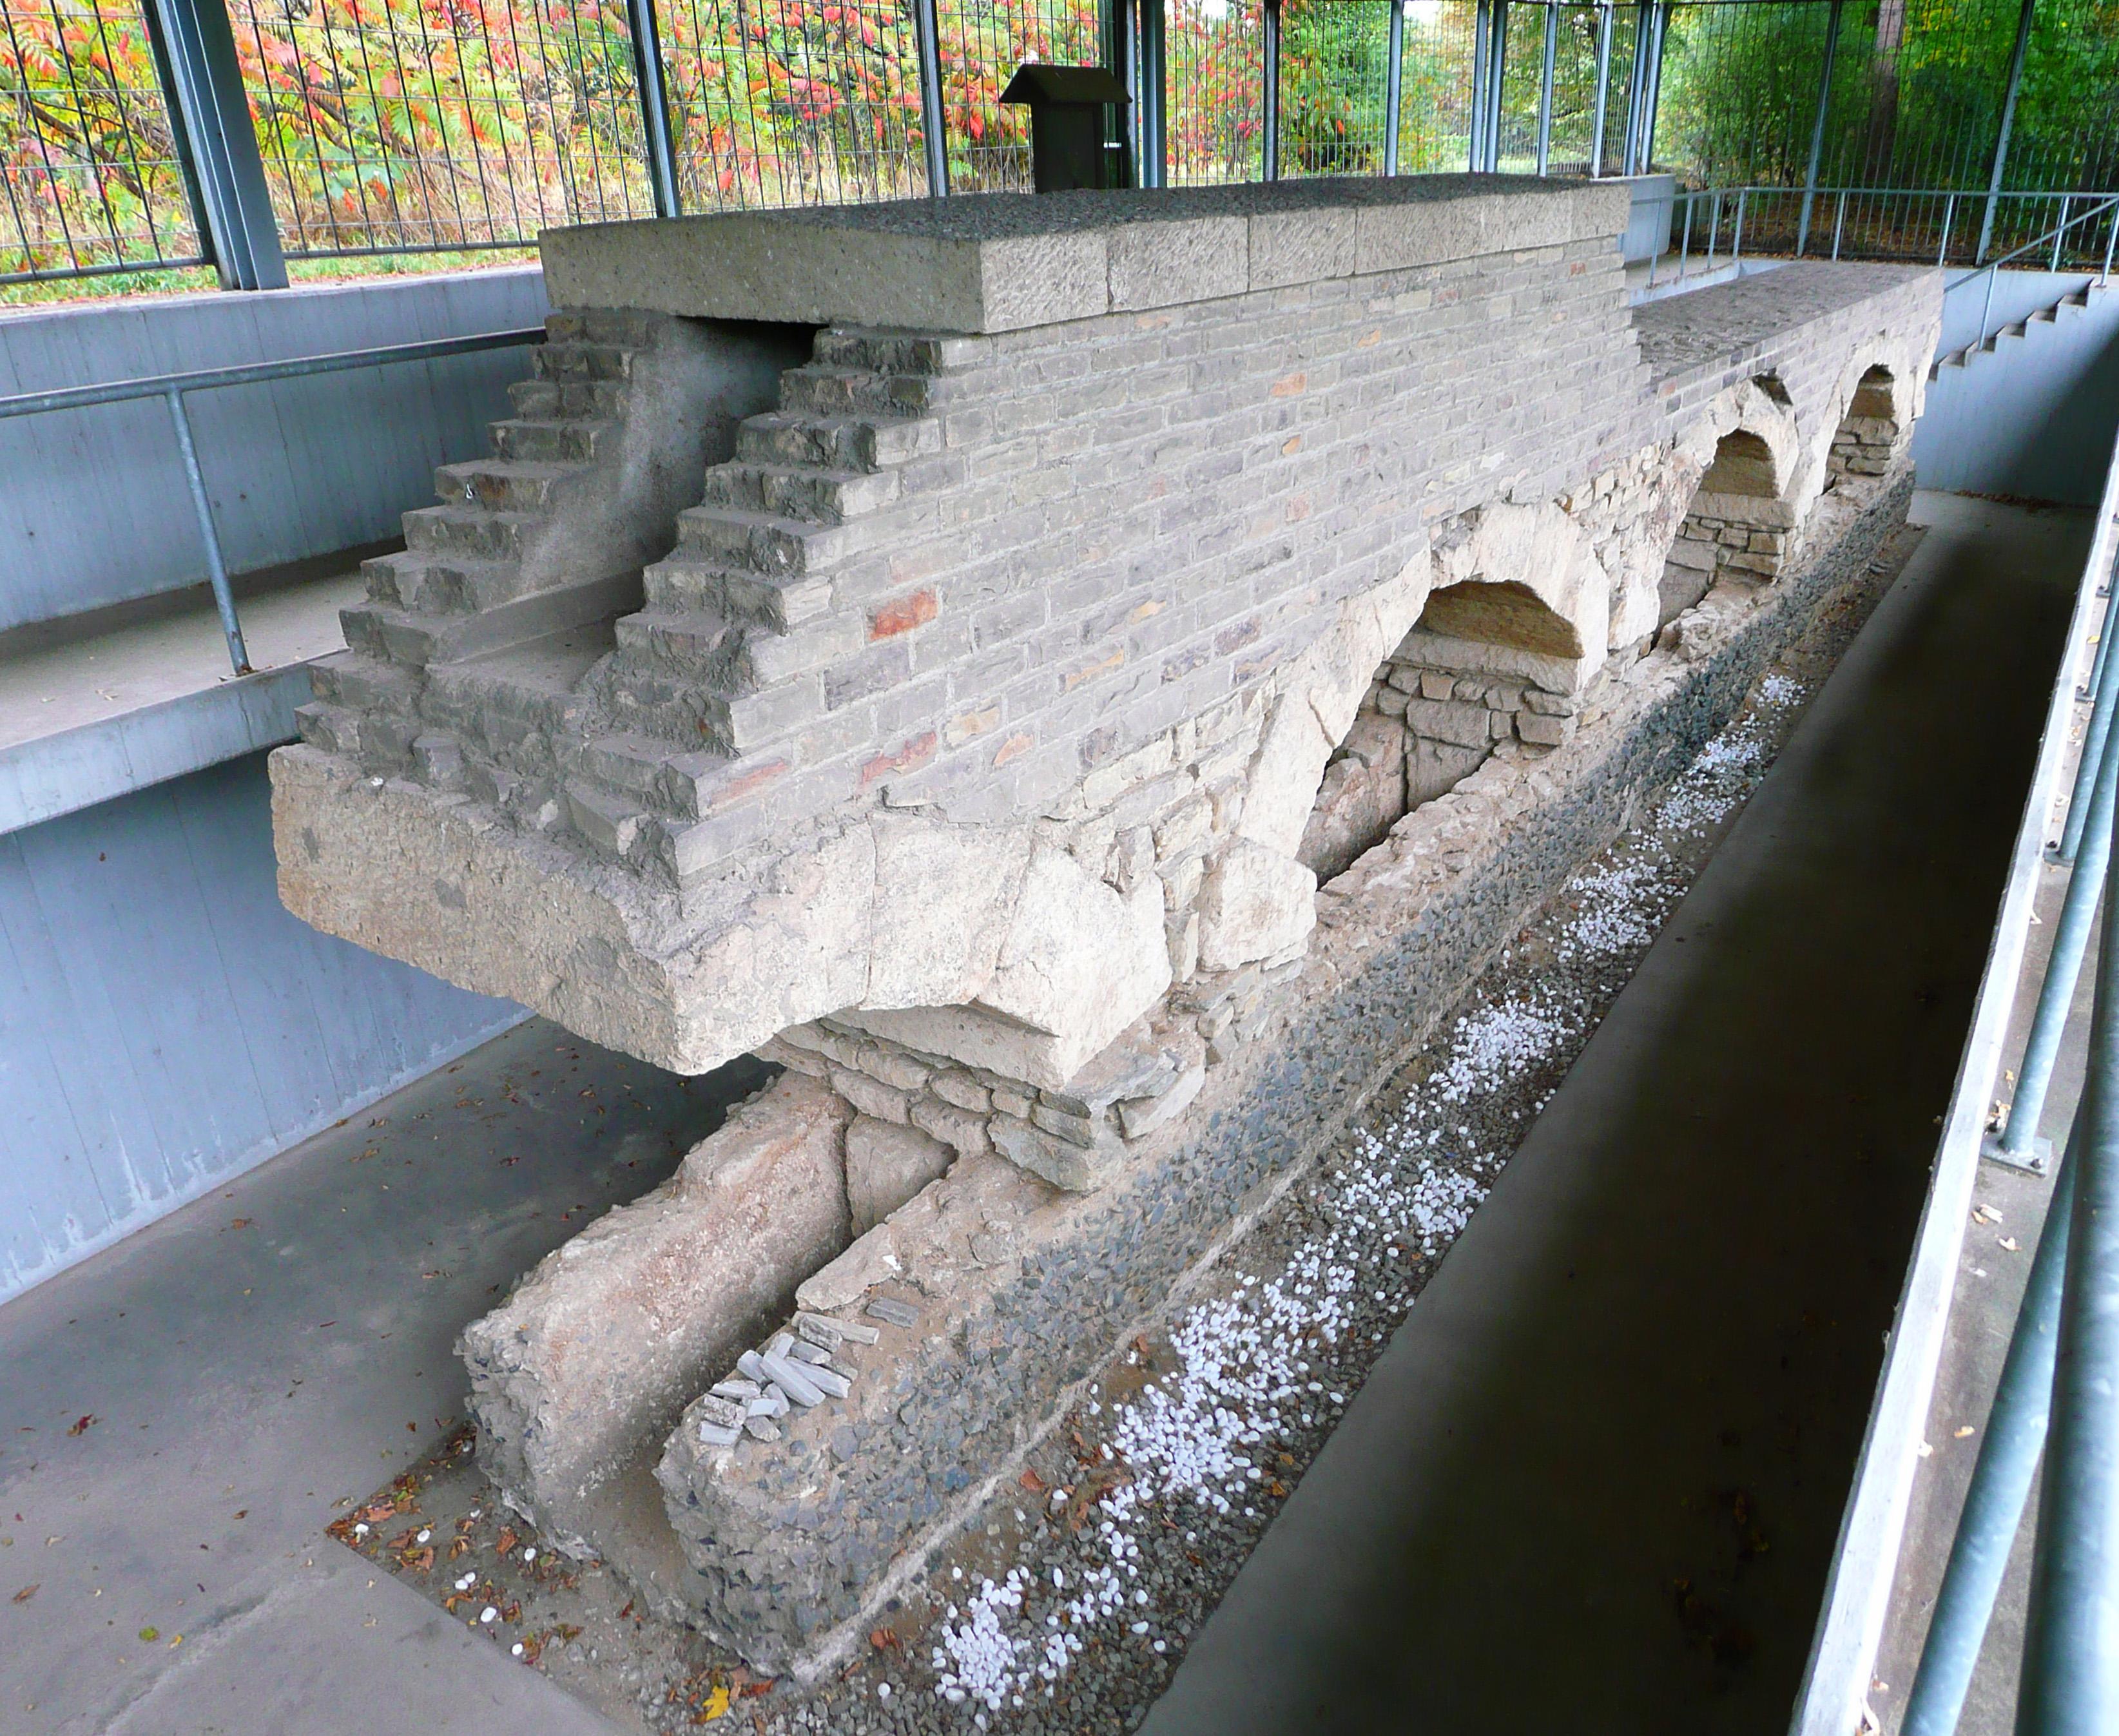 file hürth hermülheim roman eifel aqueduct pic 01 jpg